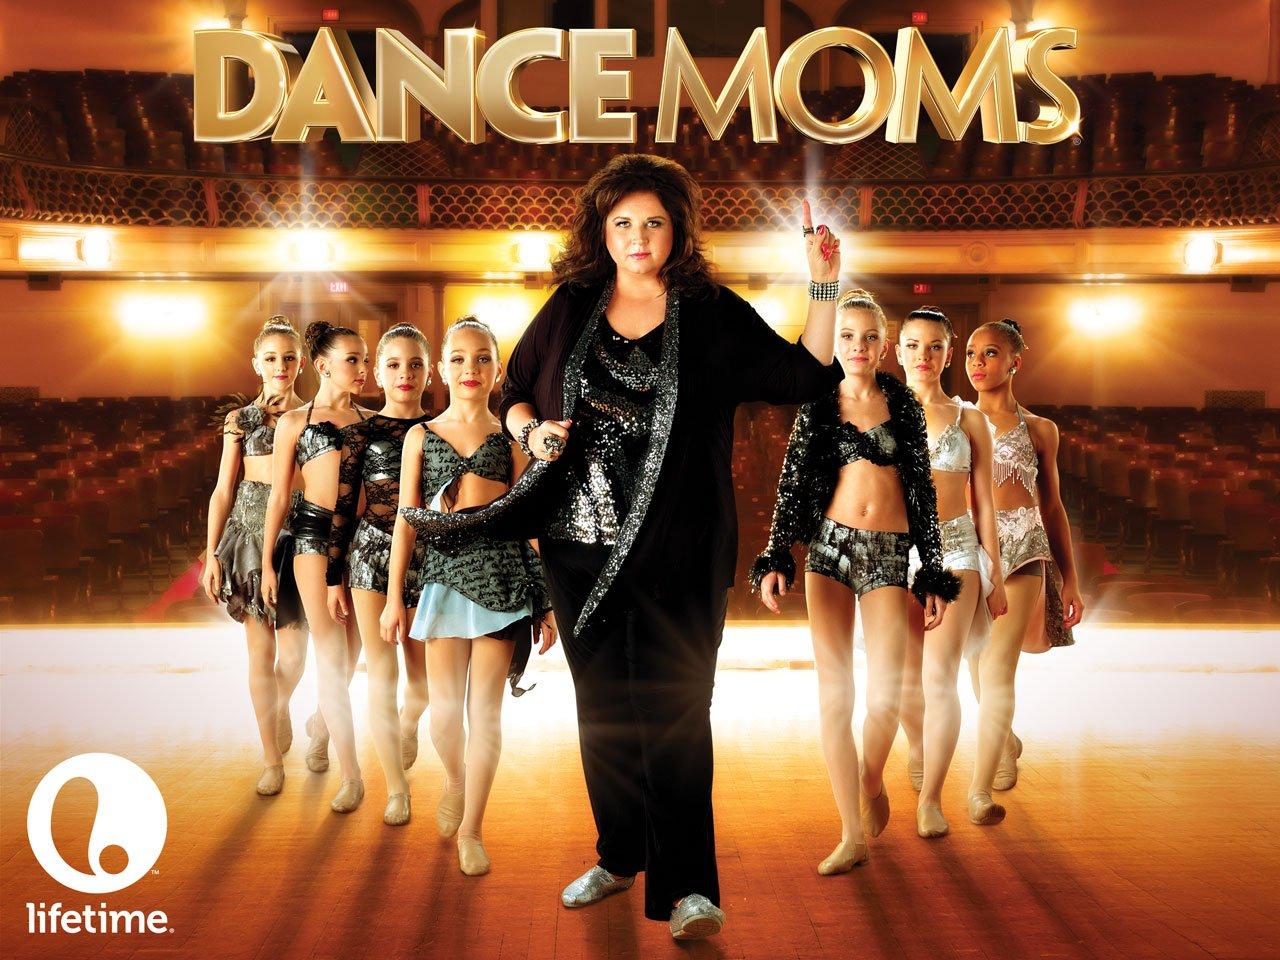 dance moms season 3 episode 31 the dancing dead